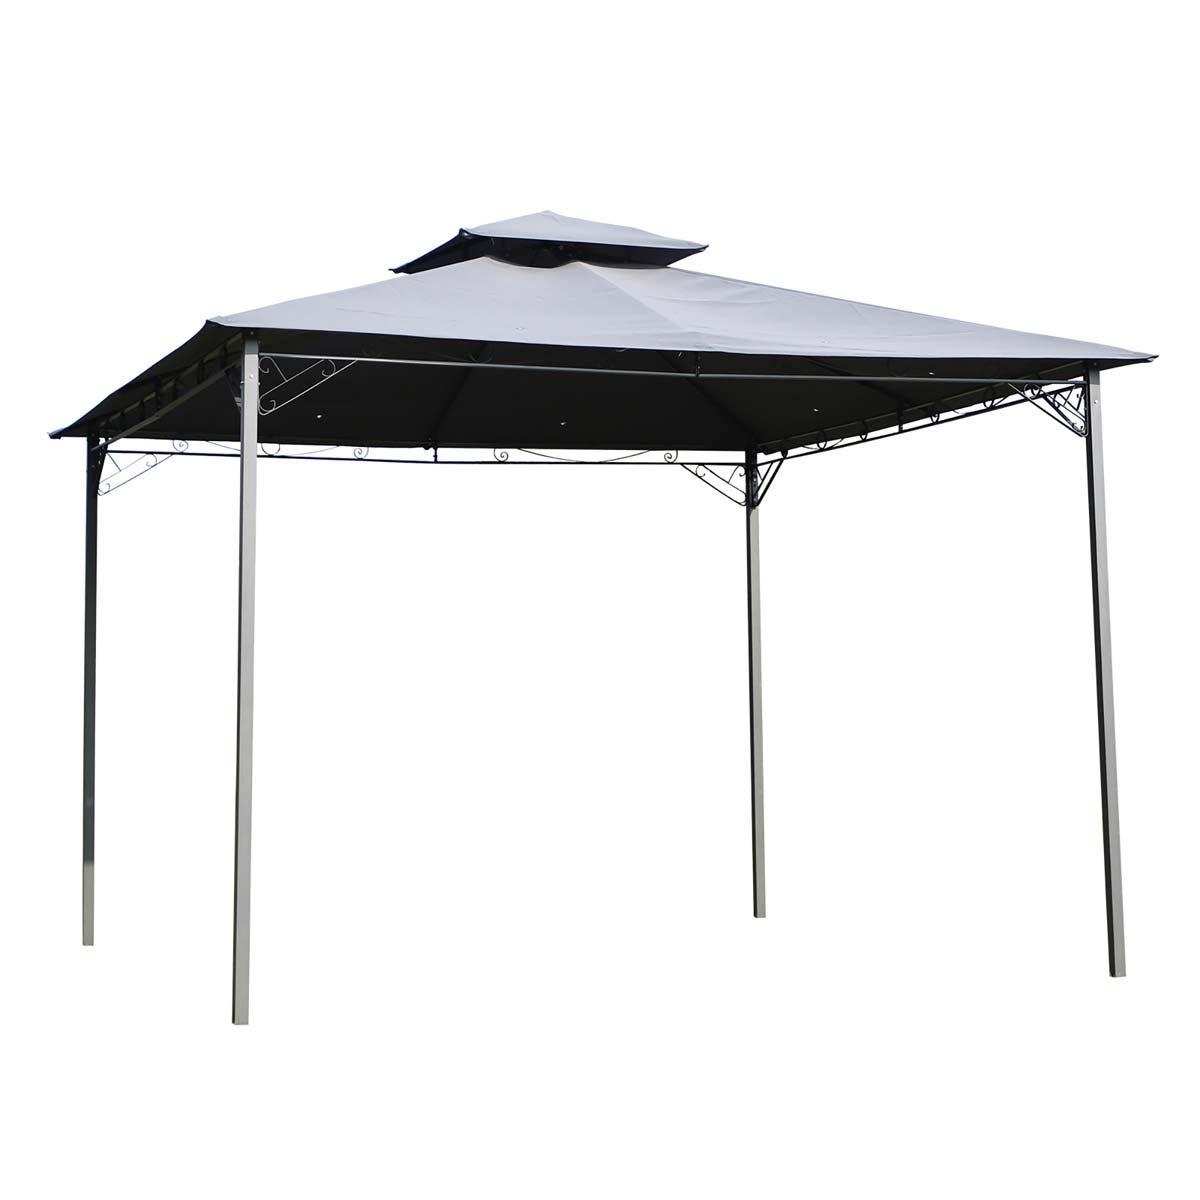 Outsunny 3 x 3m Outdoor Gazebo Shelter - Grey